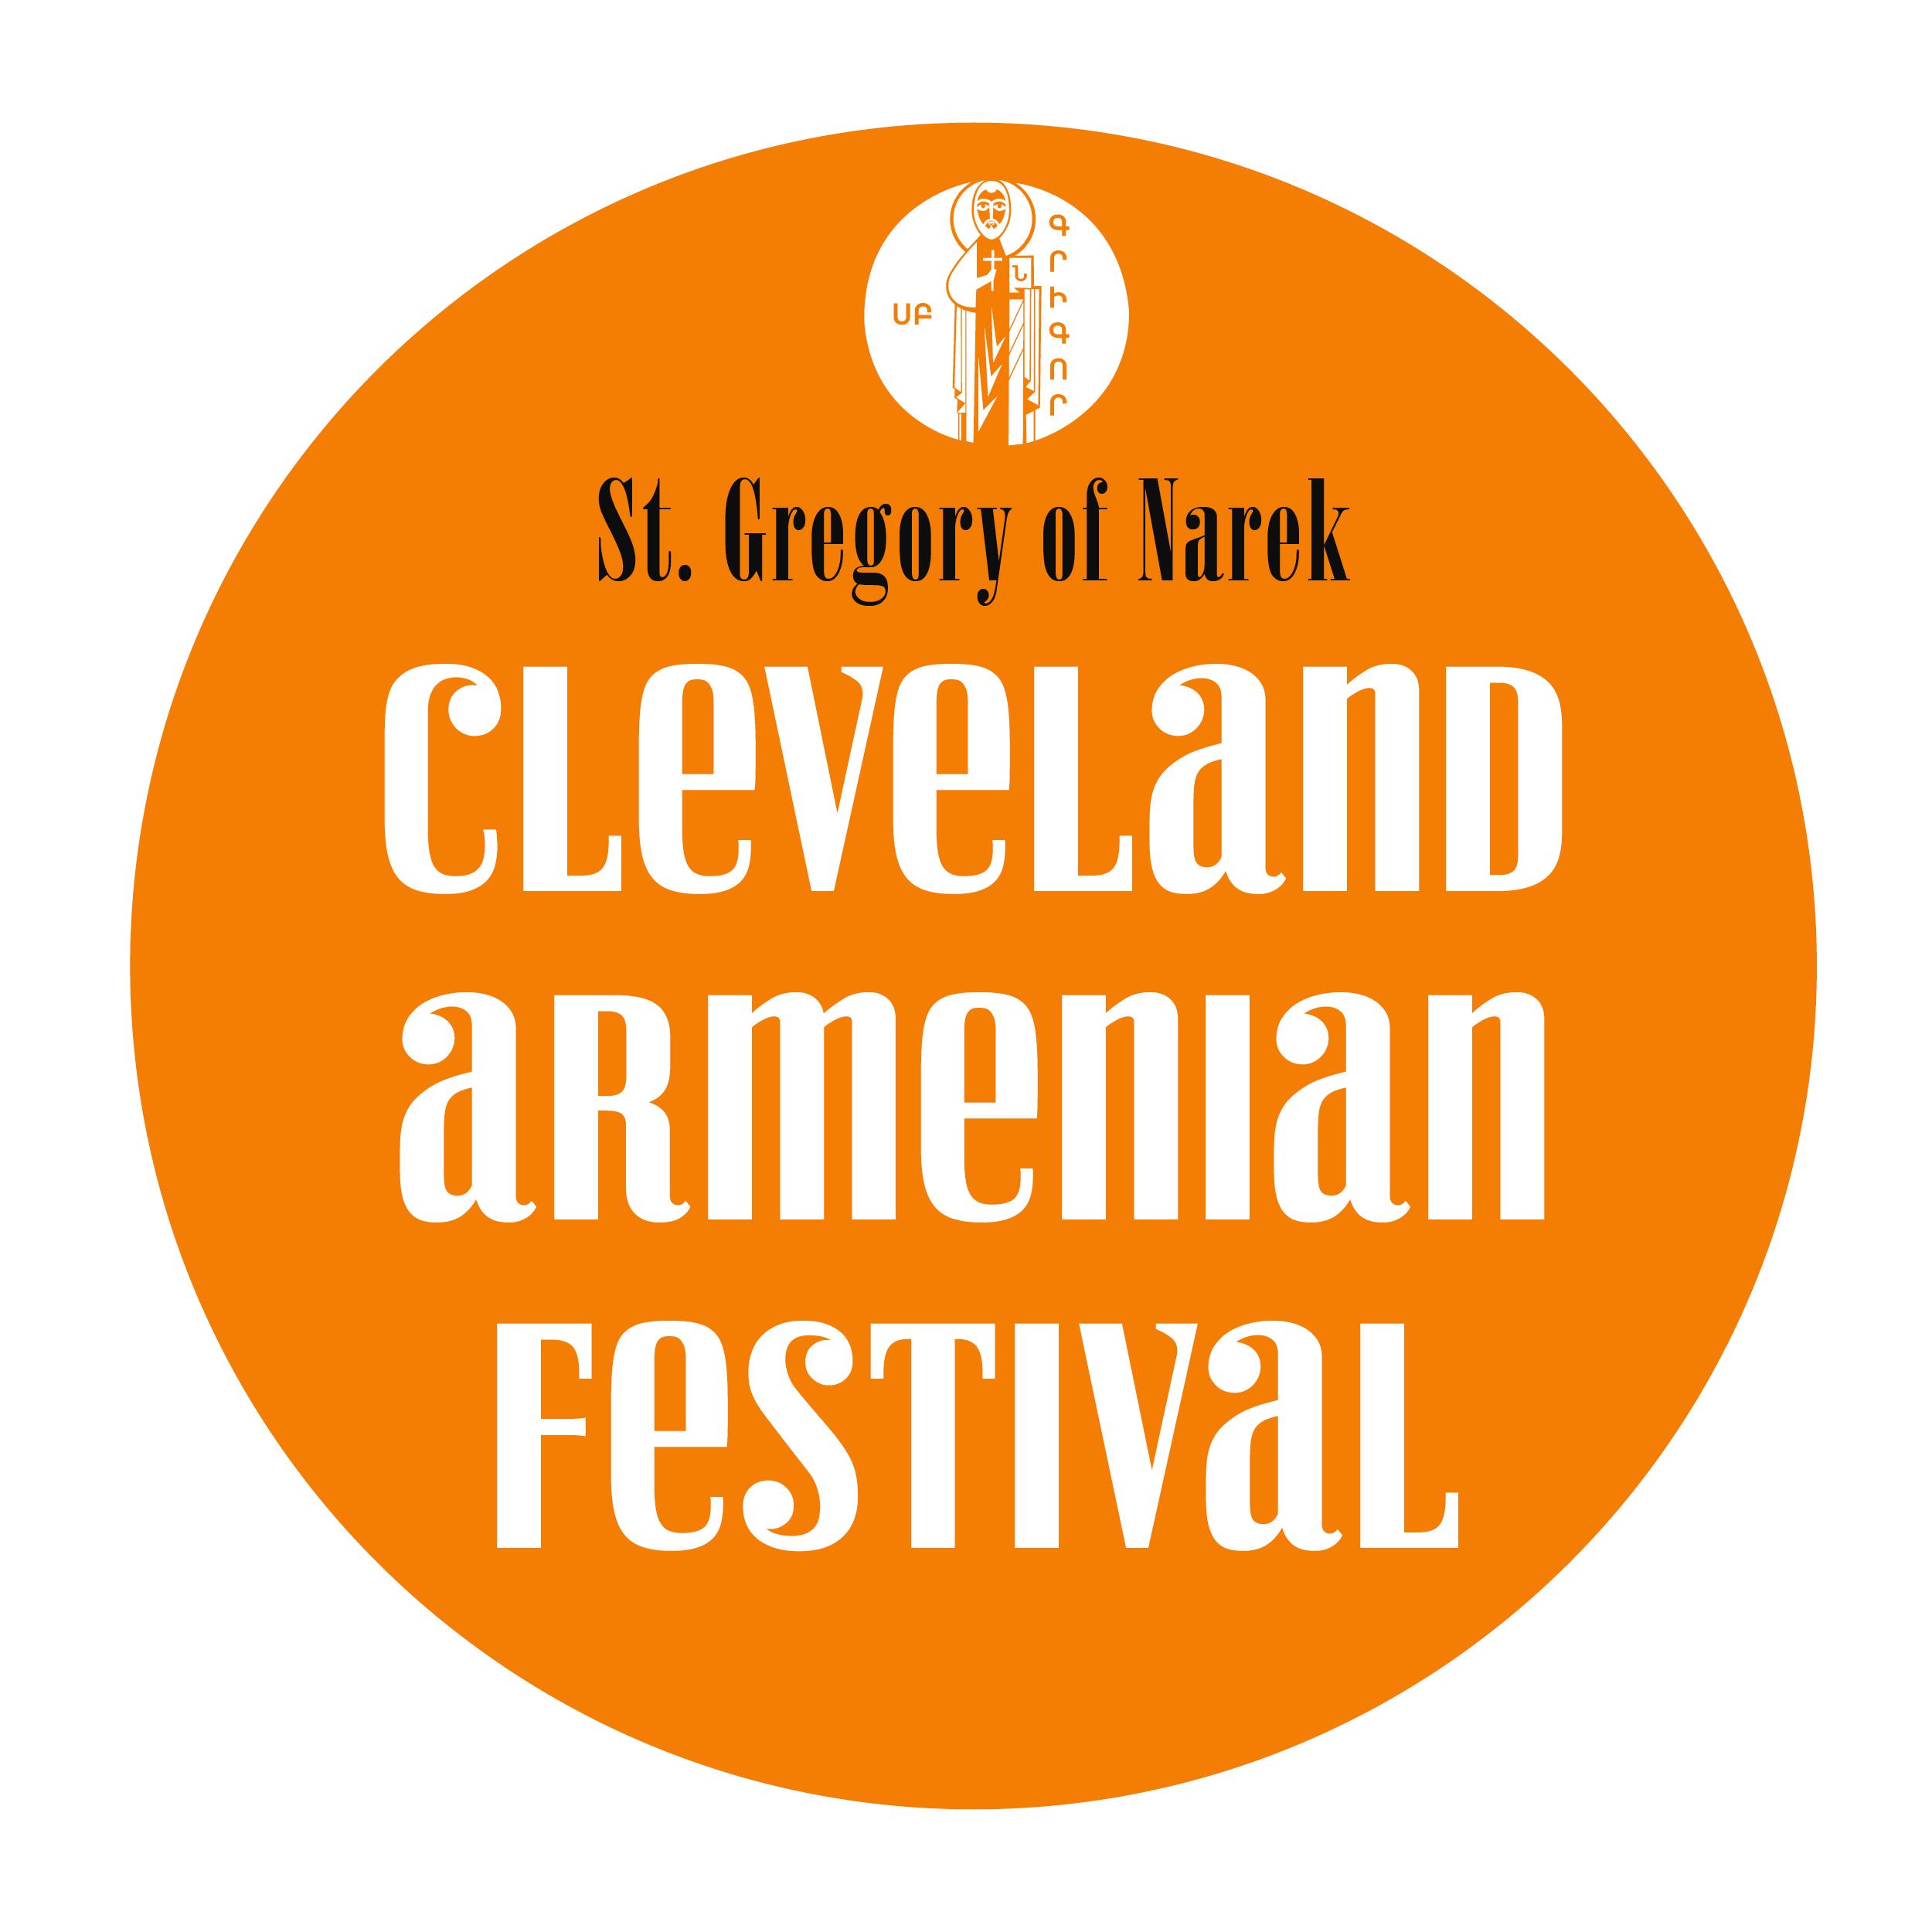 Cleveland Armenian Festival